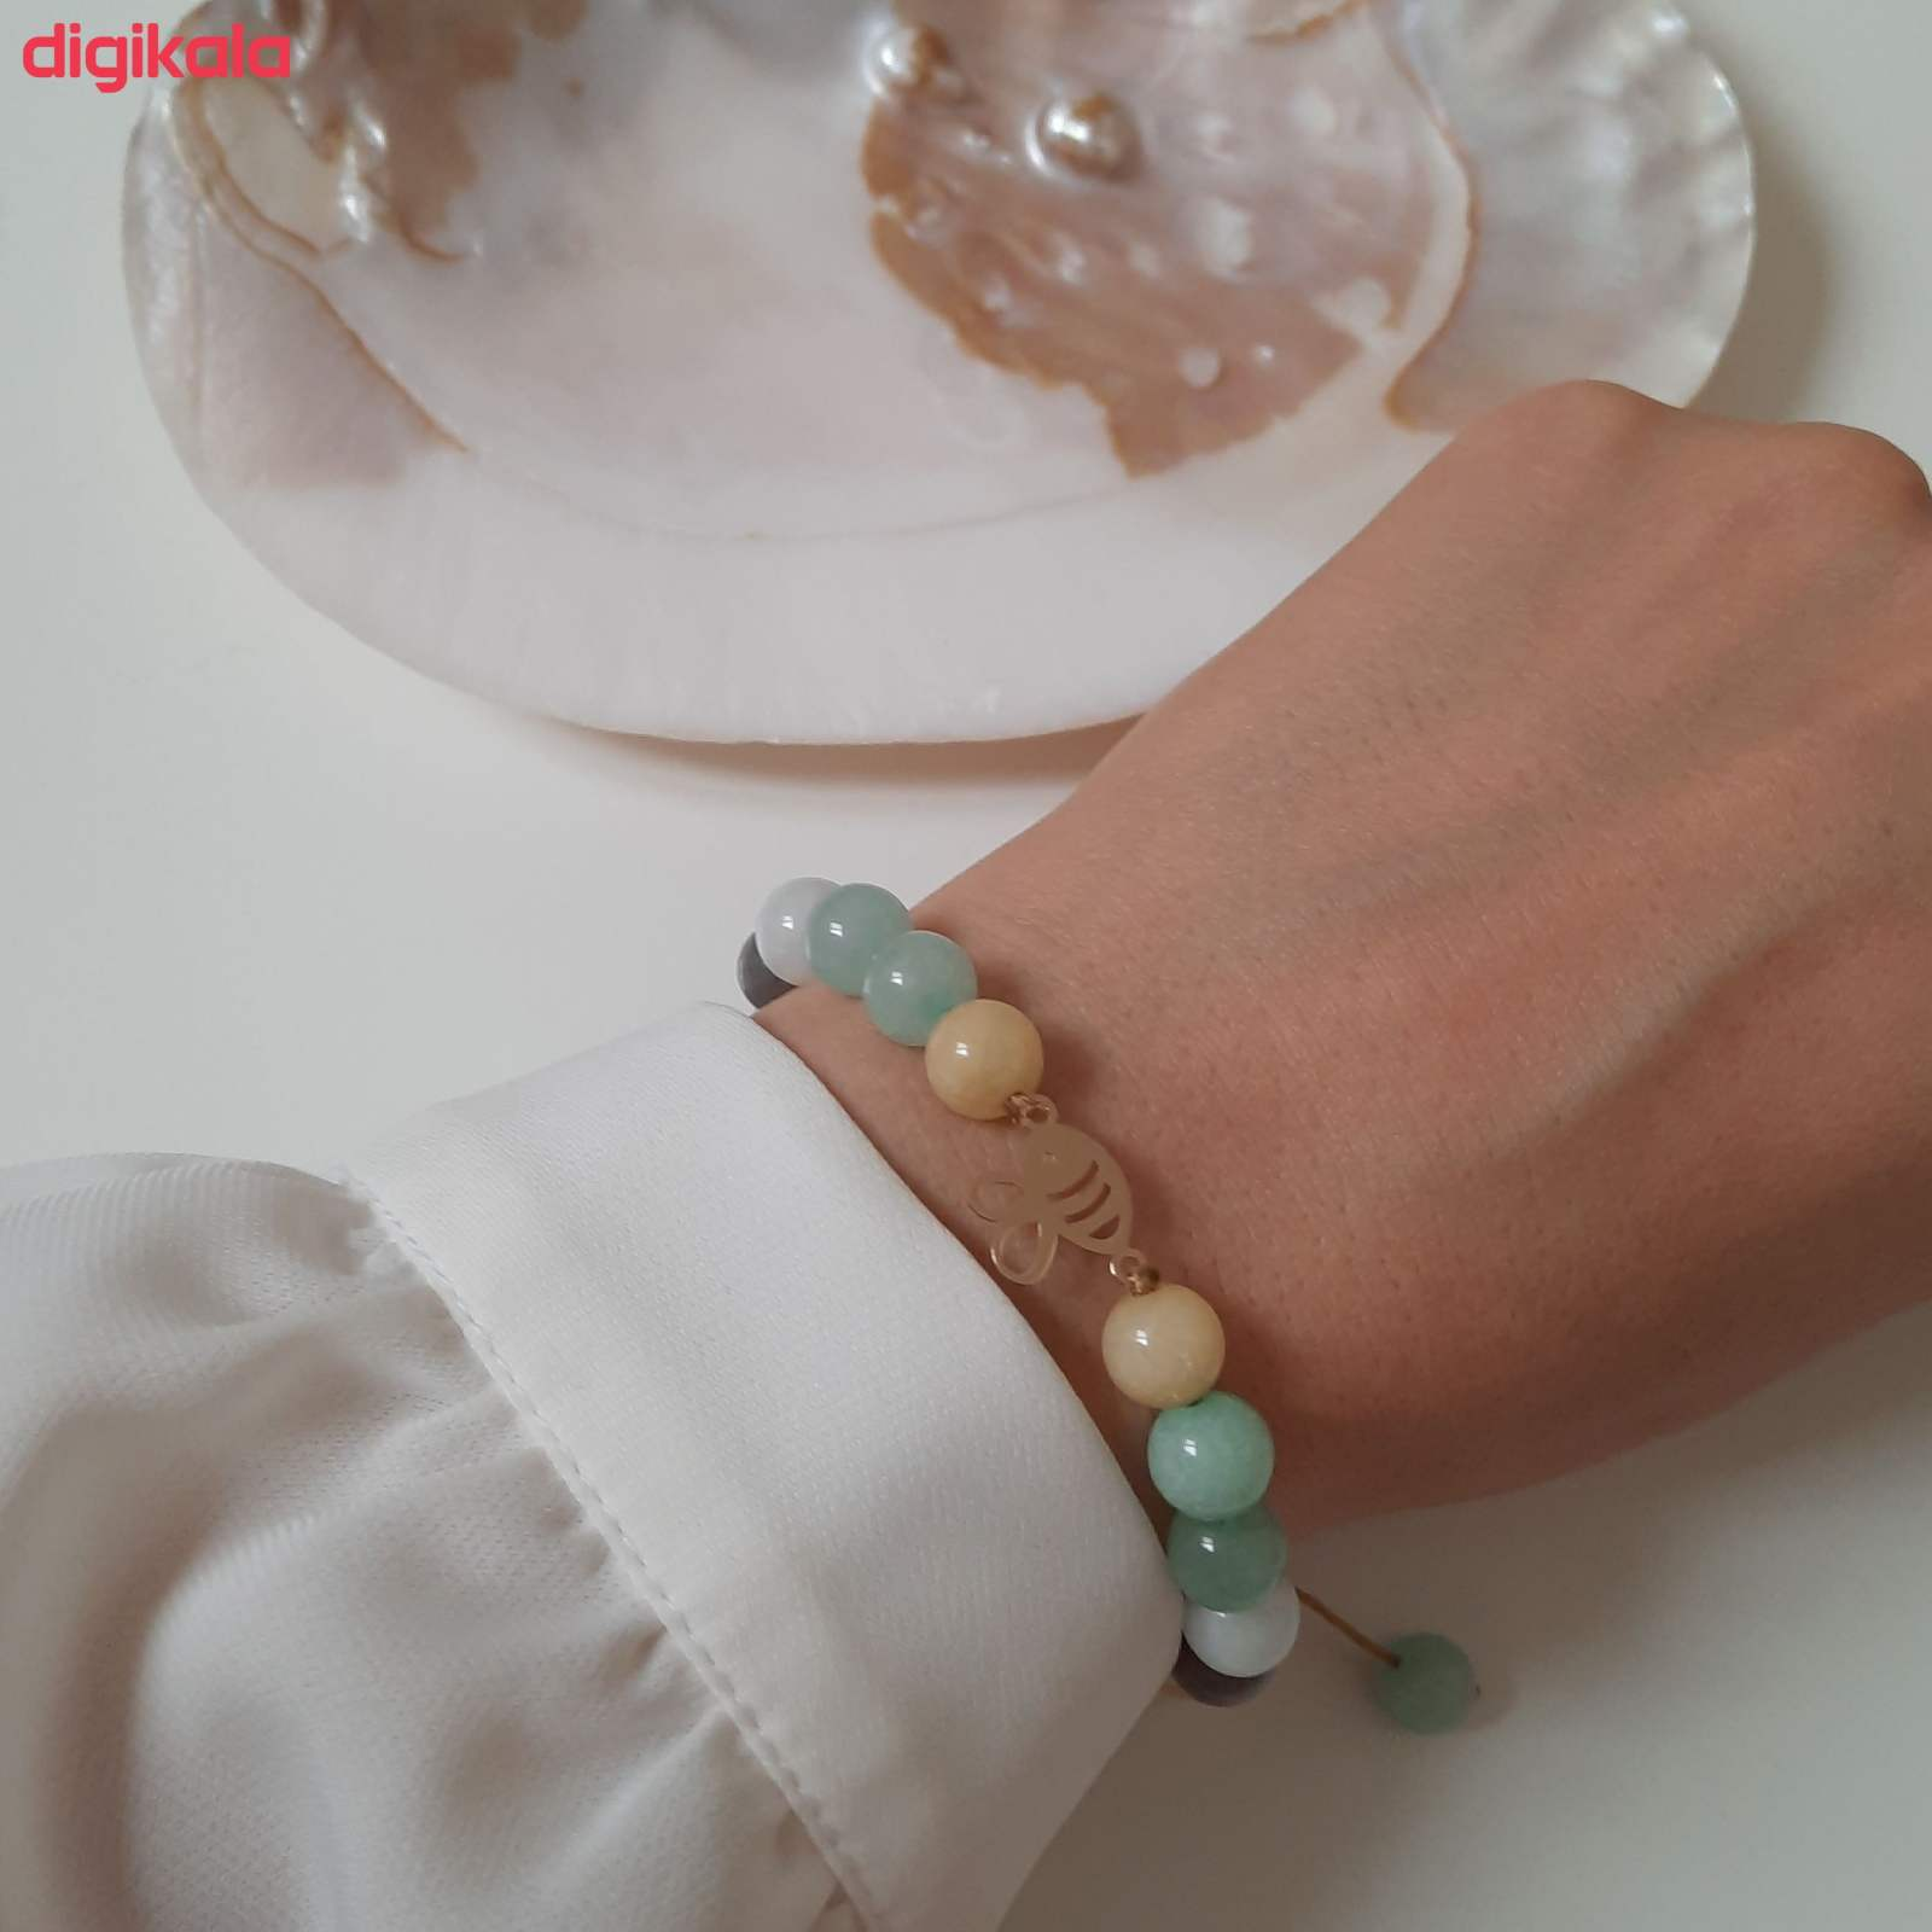 دستبند طلا 18 عیار زنانه الماسین آذر کد ZANBUR01 -  - 6